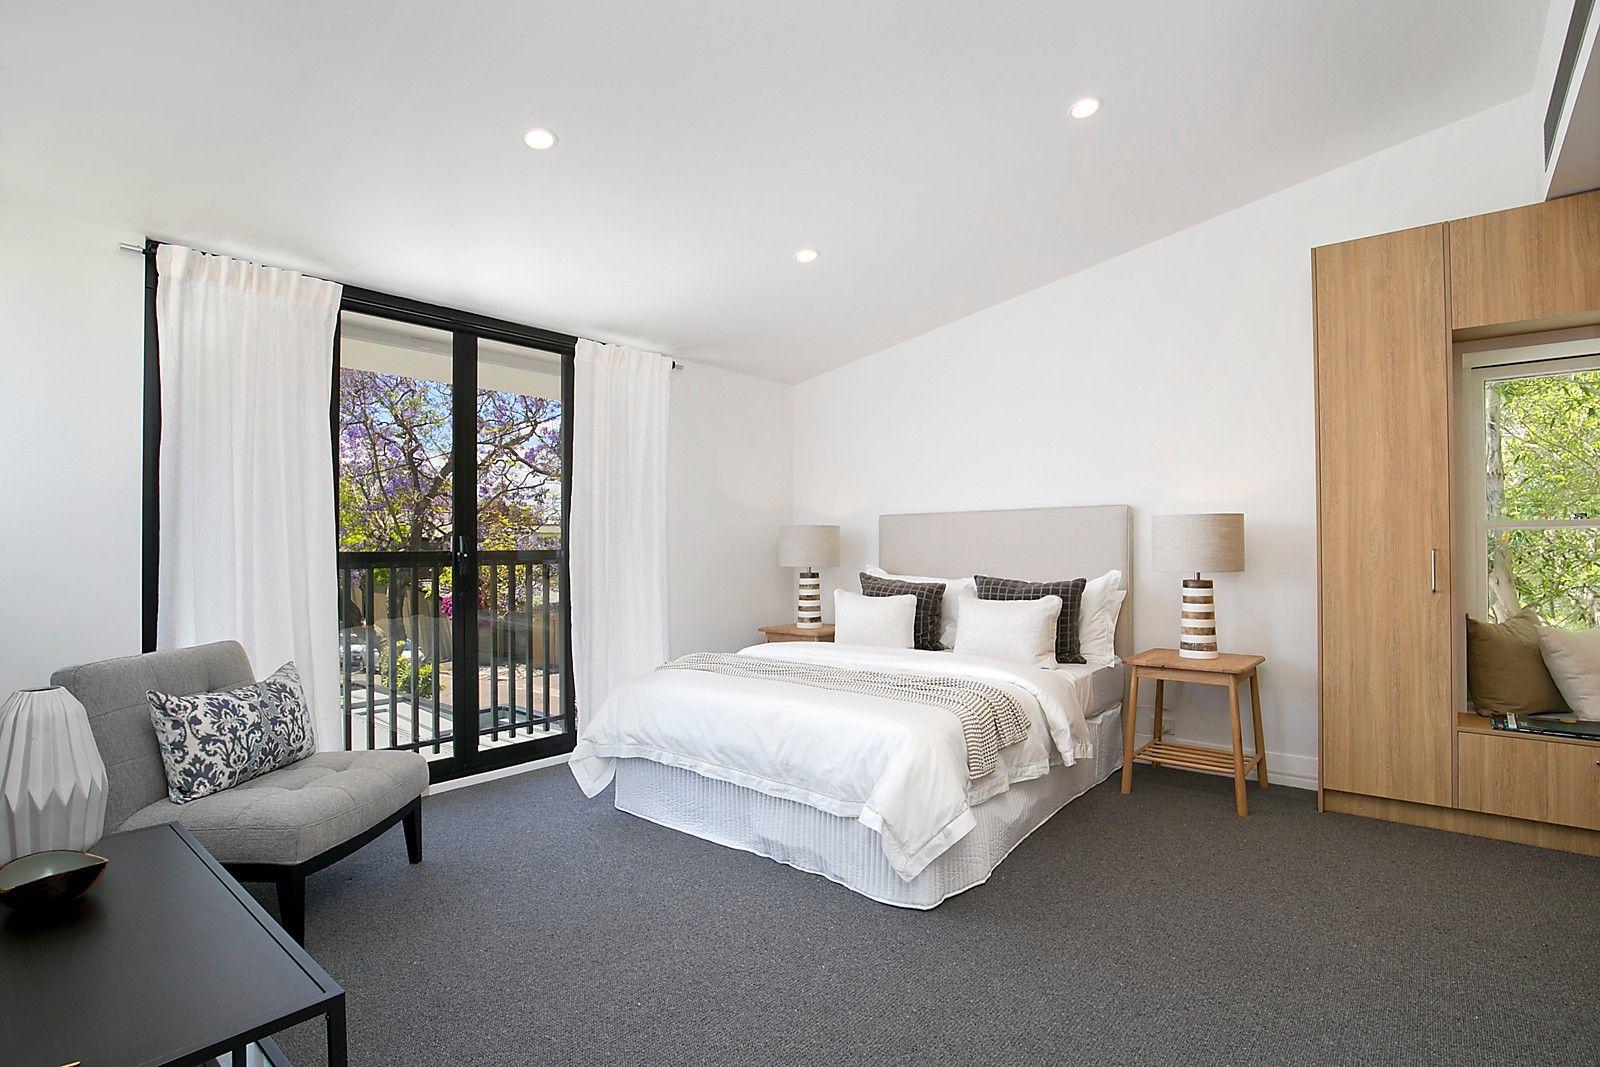 Best Main Bedroom W Views Bespoke Wir Ensuite With Images 400 x 300